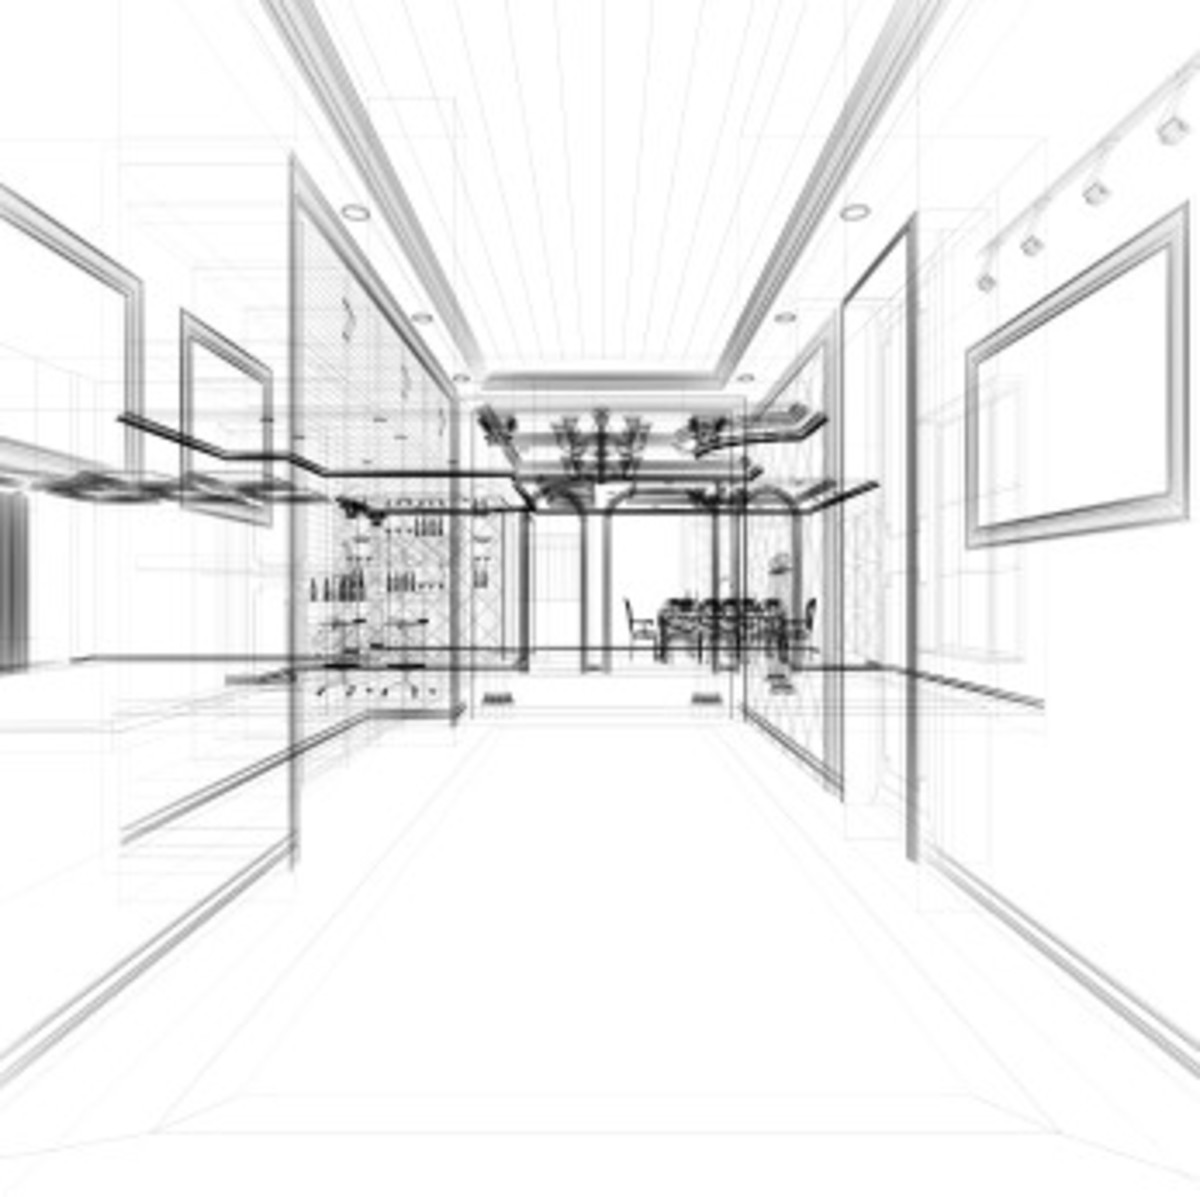 Final Major Interior Design Project